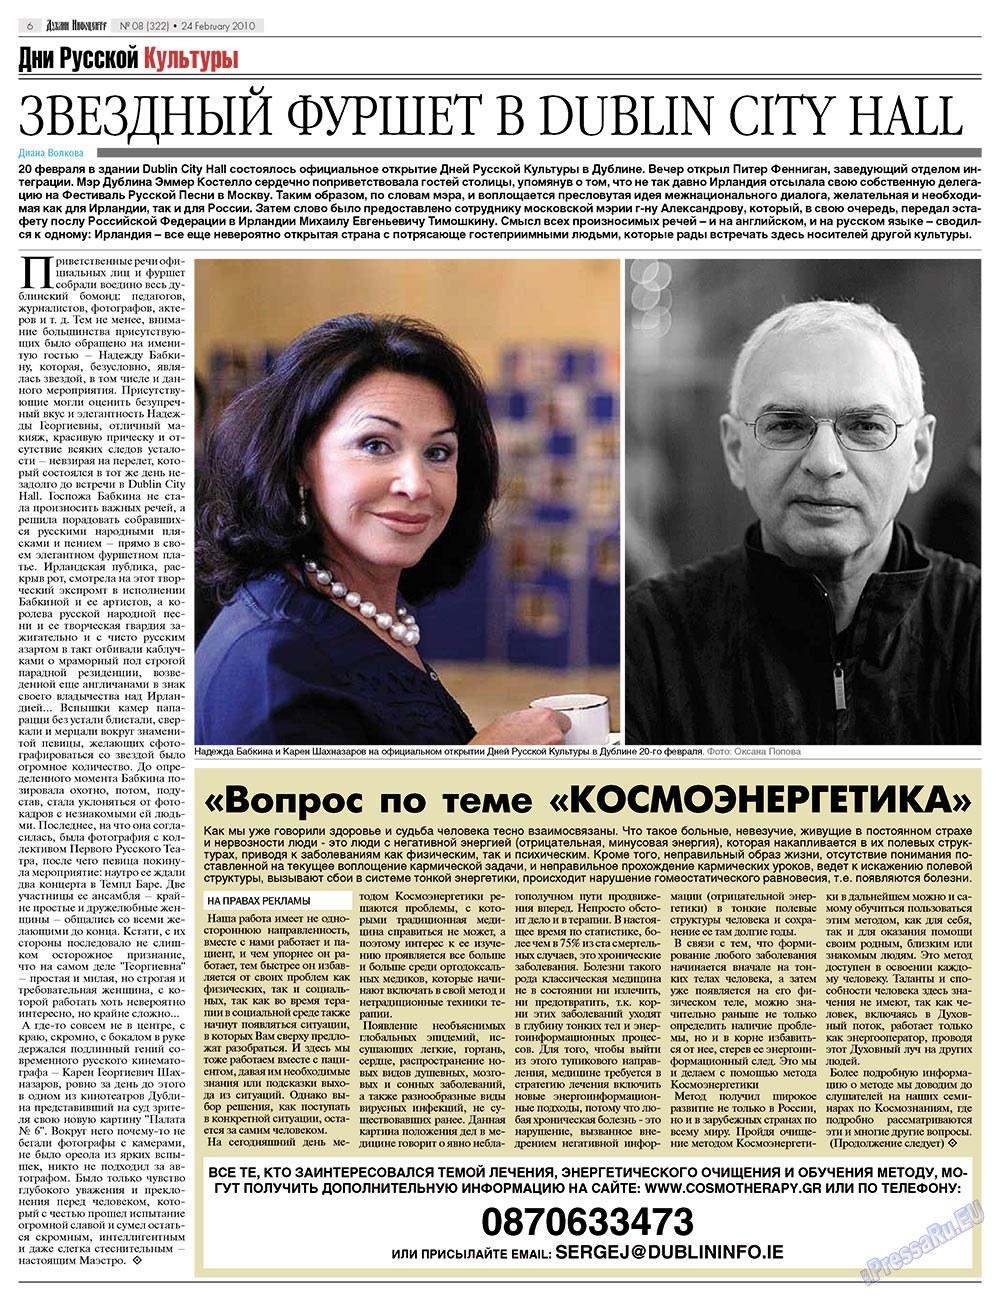 Дублин инфоцентр (газета). 2010 год, номер 8, стр. 6